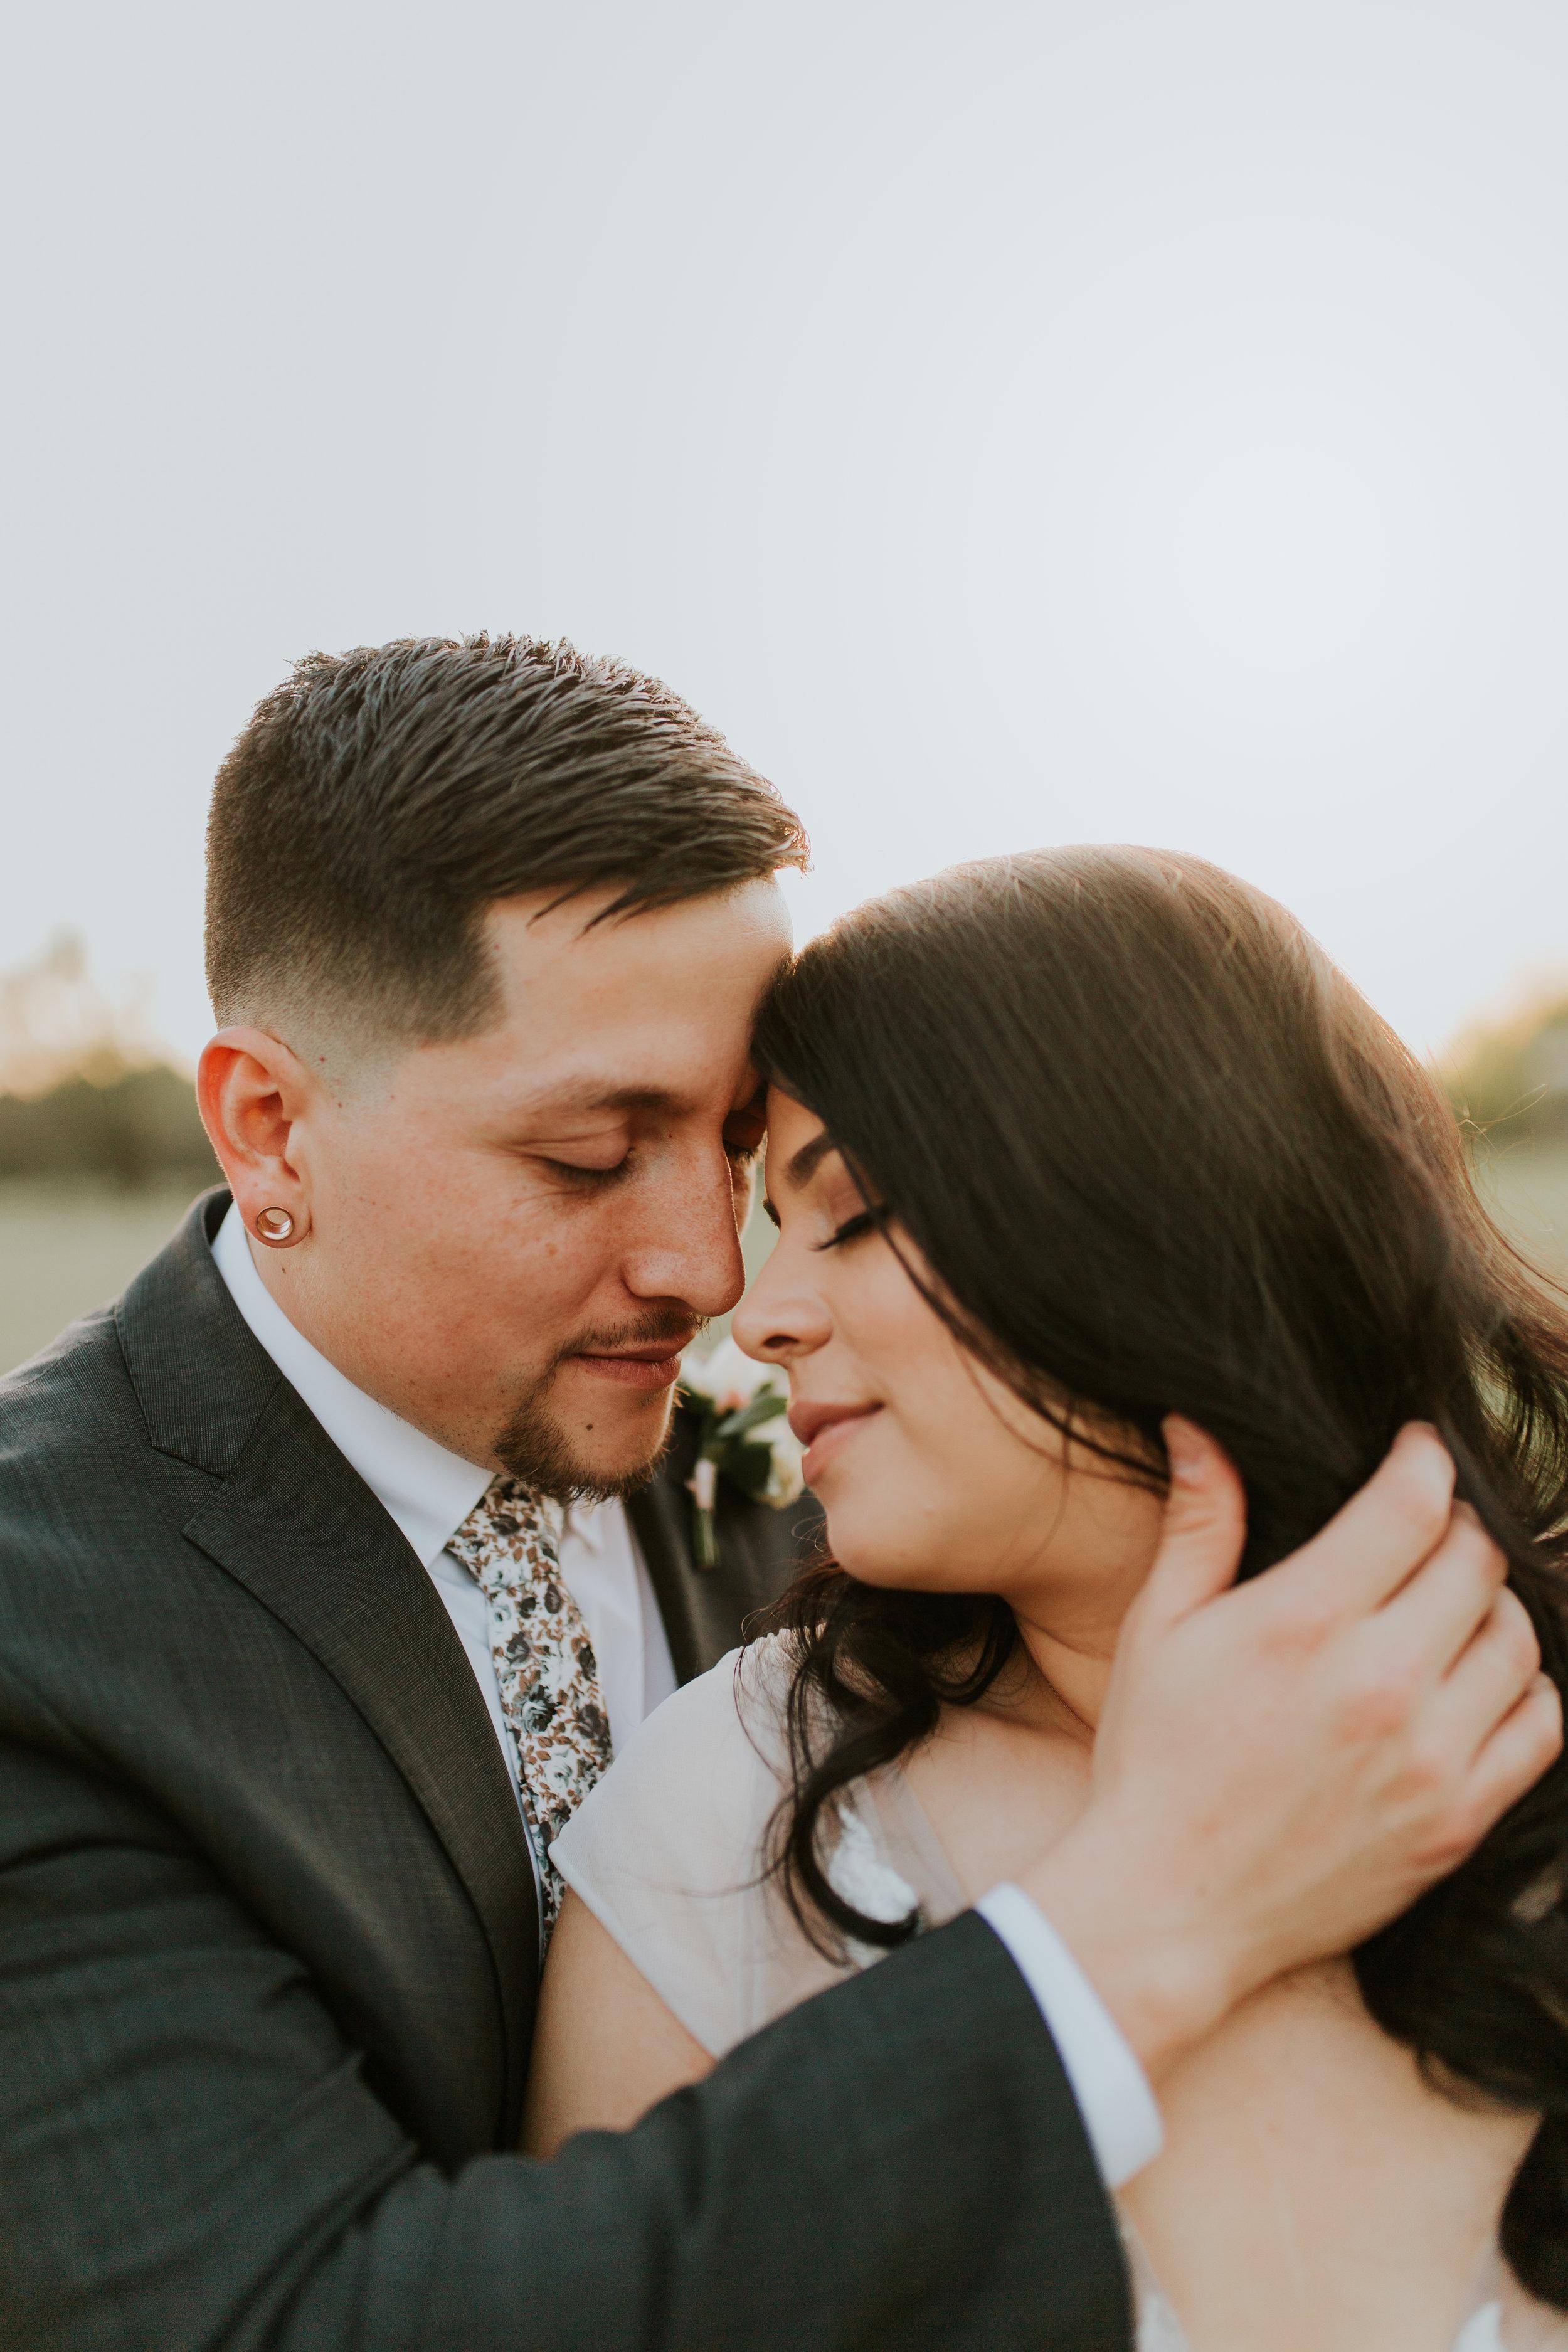 Sarah + Michael  ↠  HISTORICAL FARMHOUSE WEDDING  Gruene Estate  New braunfels, tx